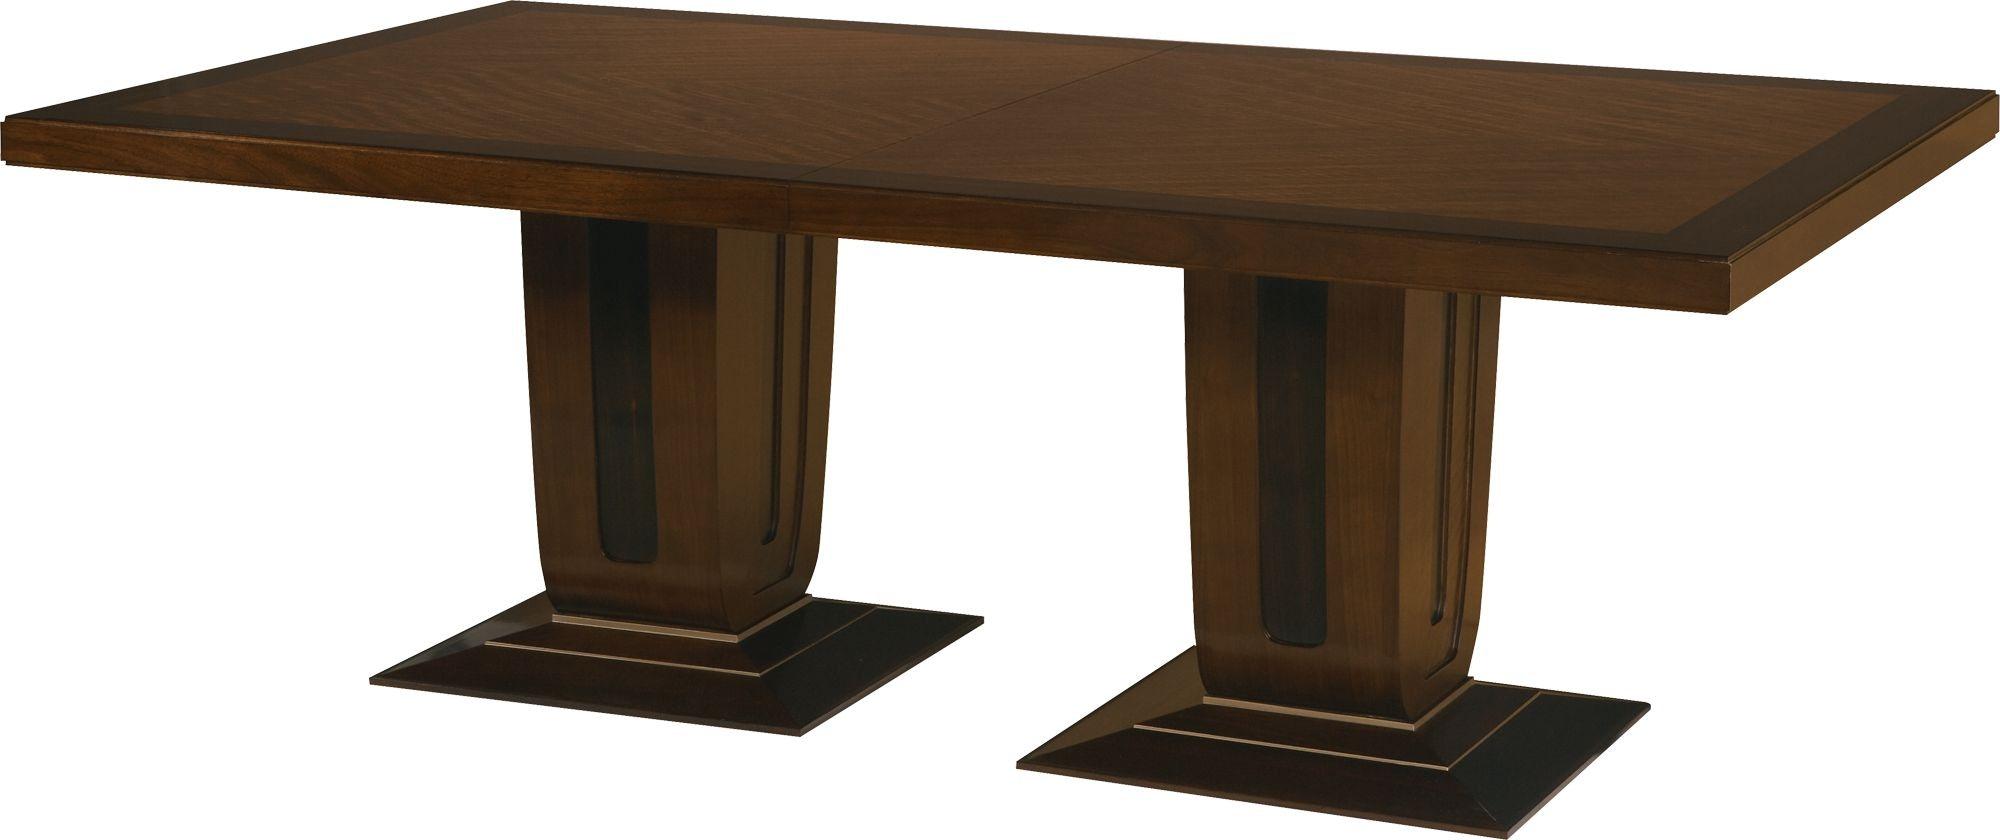 baker furniture 4093 dining room bill sofield beekman dining table